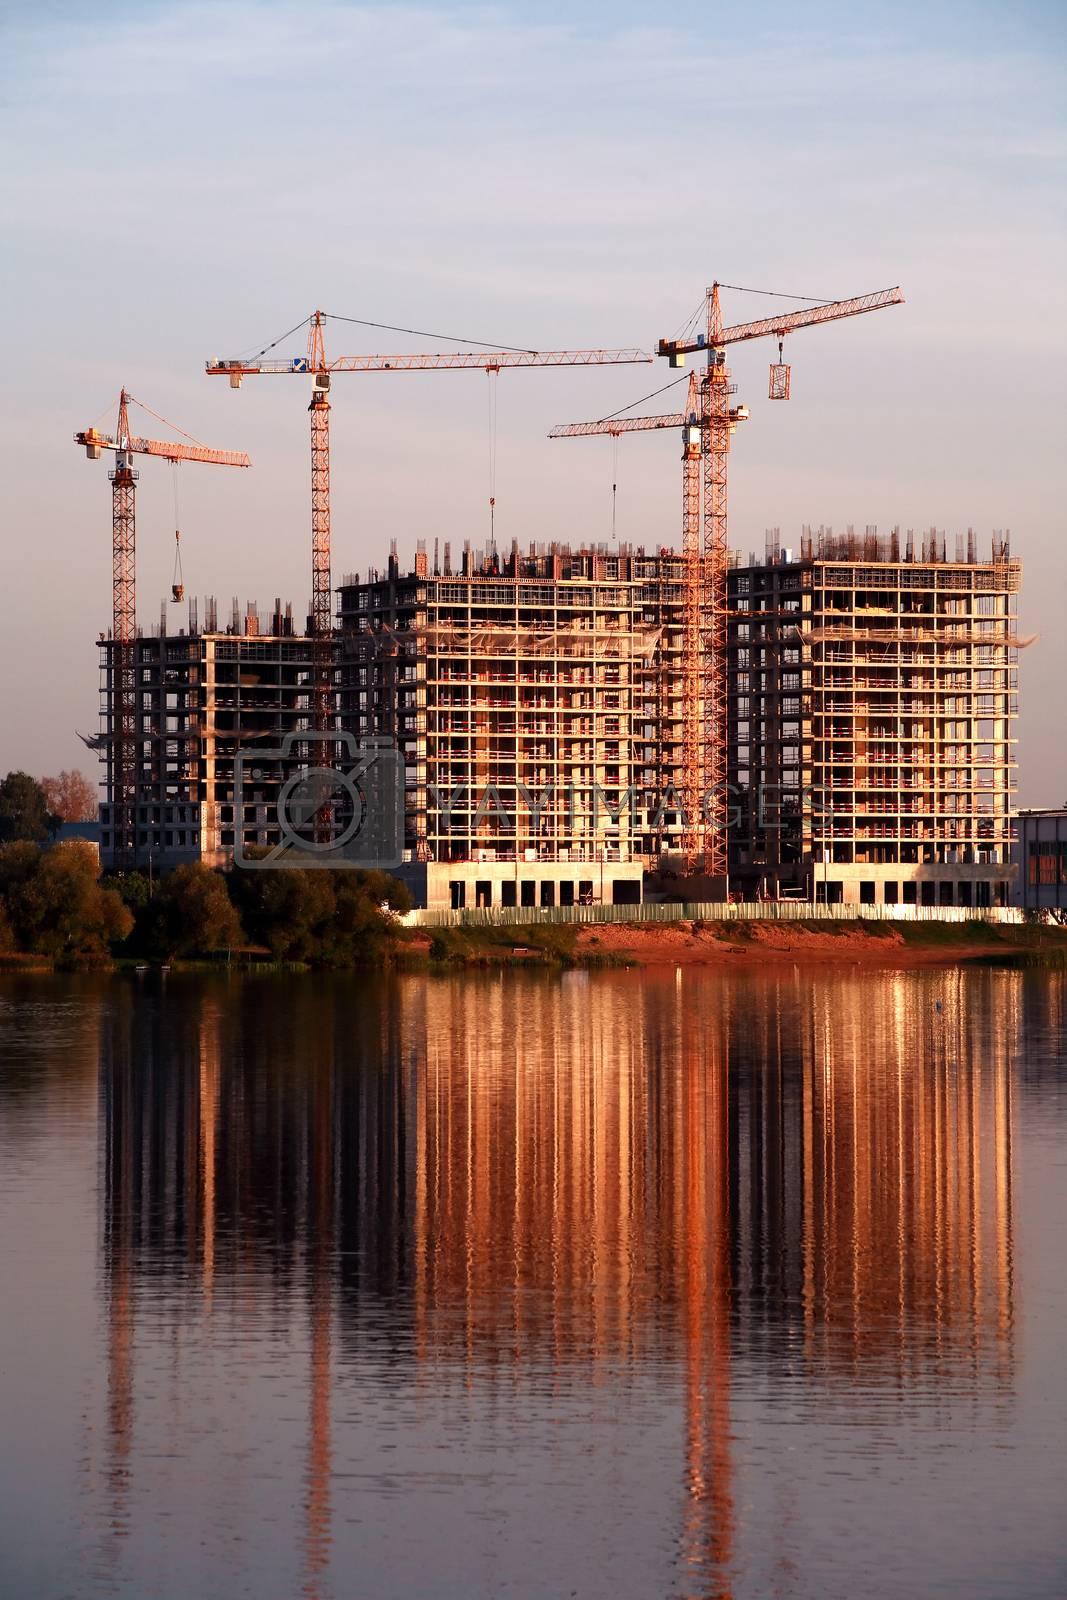 Royalty free image of Construction Near River by kvkirillov